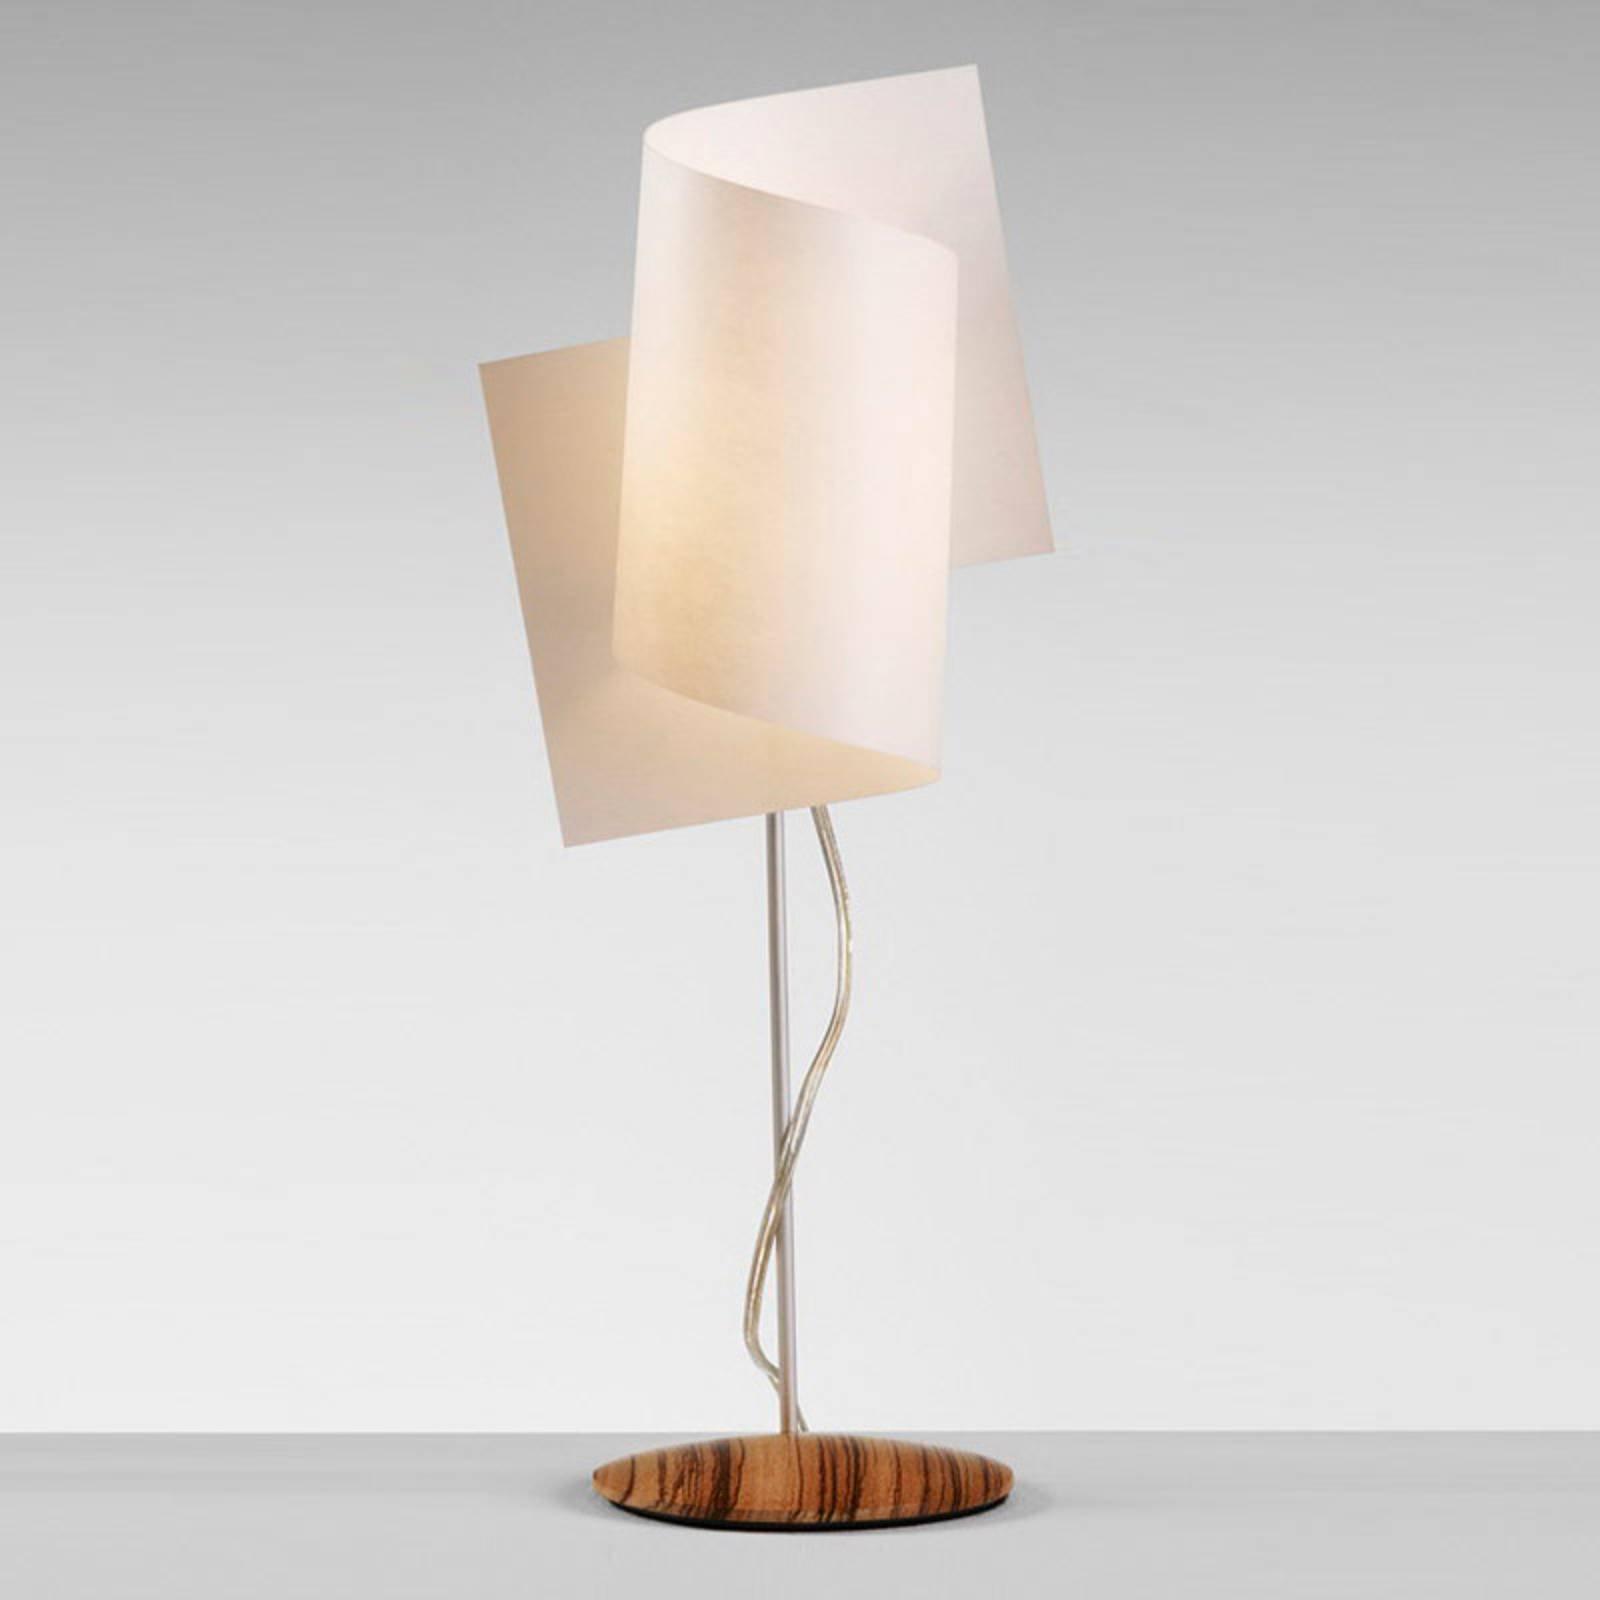 Interessant Loop bordlampe i zebrano